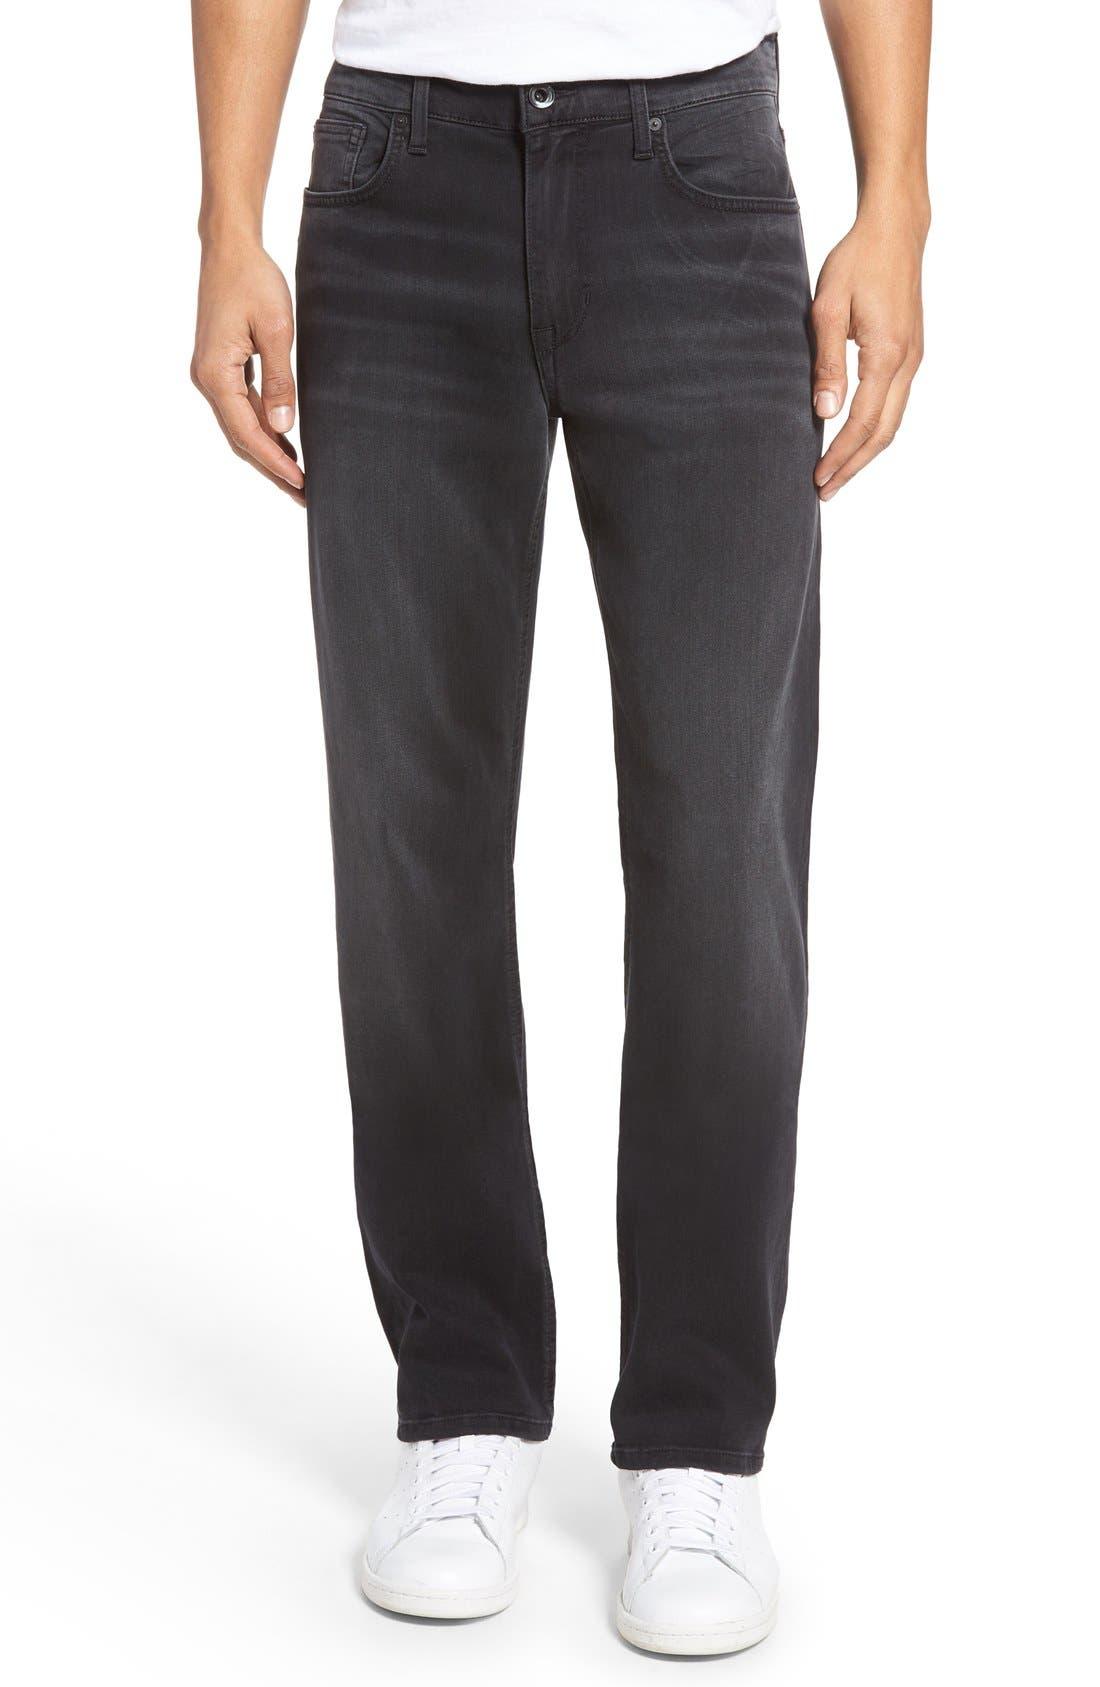 JOES Brixton Kinetic Slim Fit Jeans